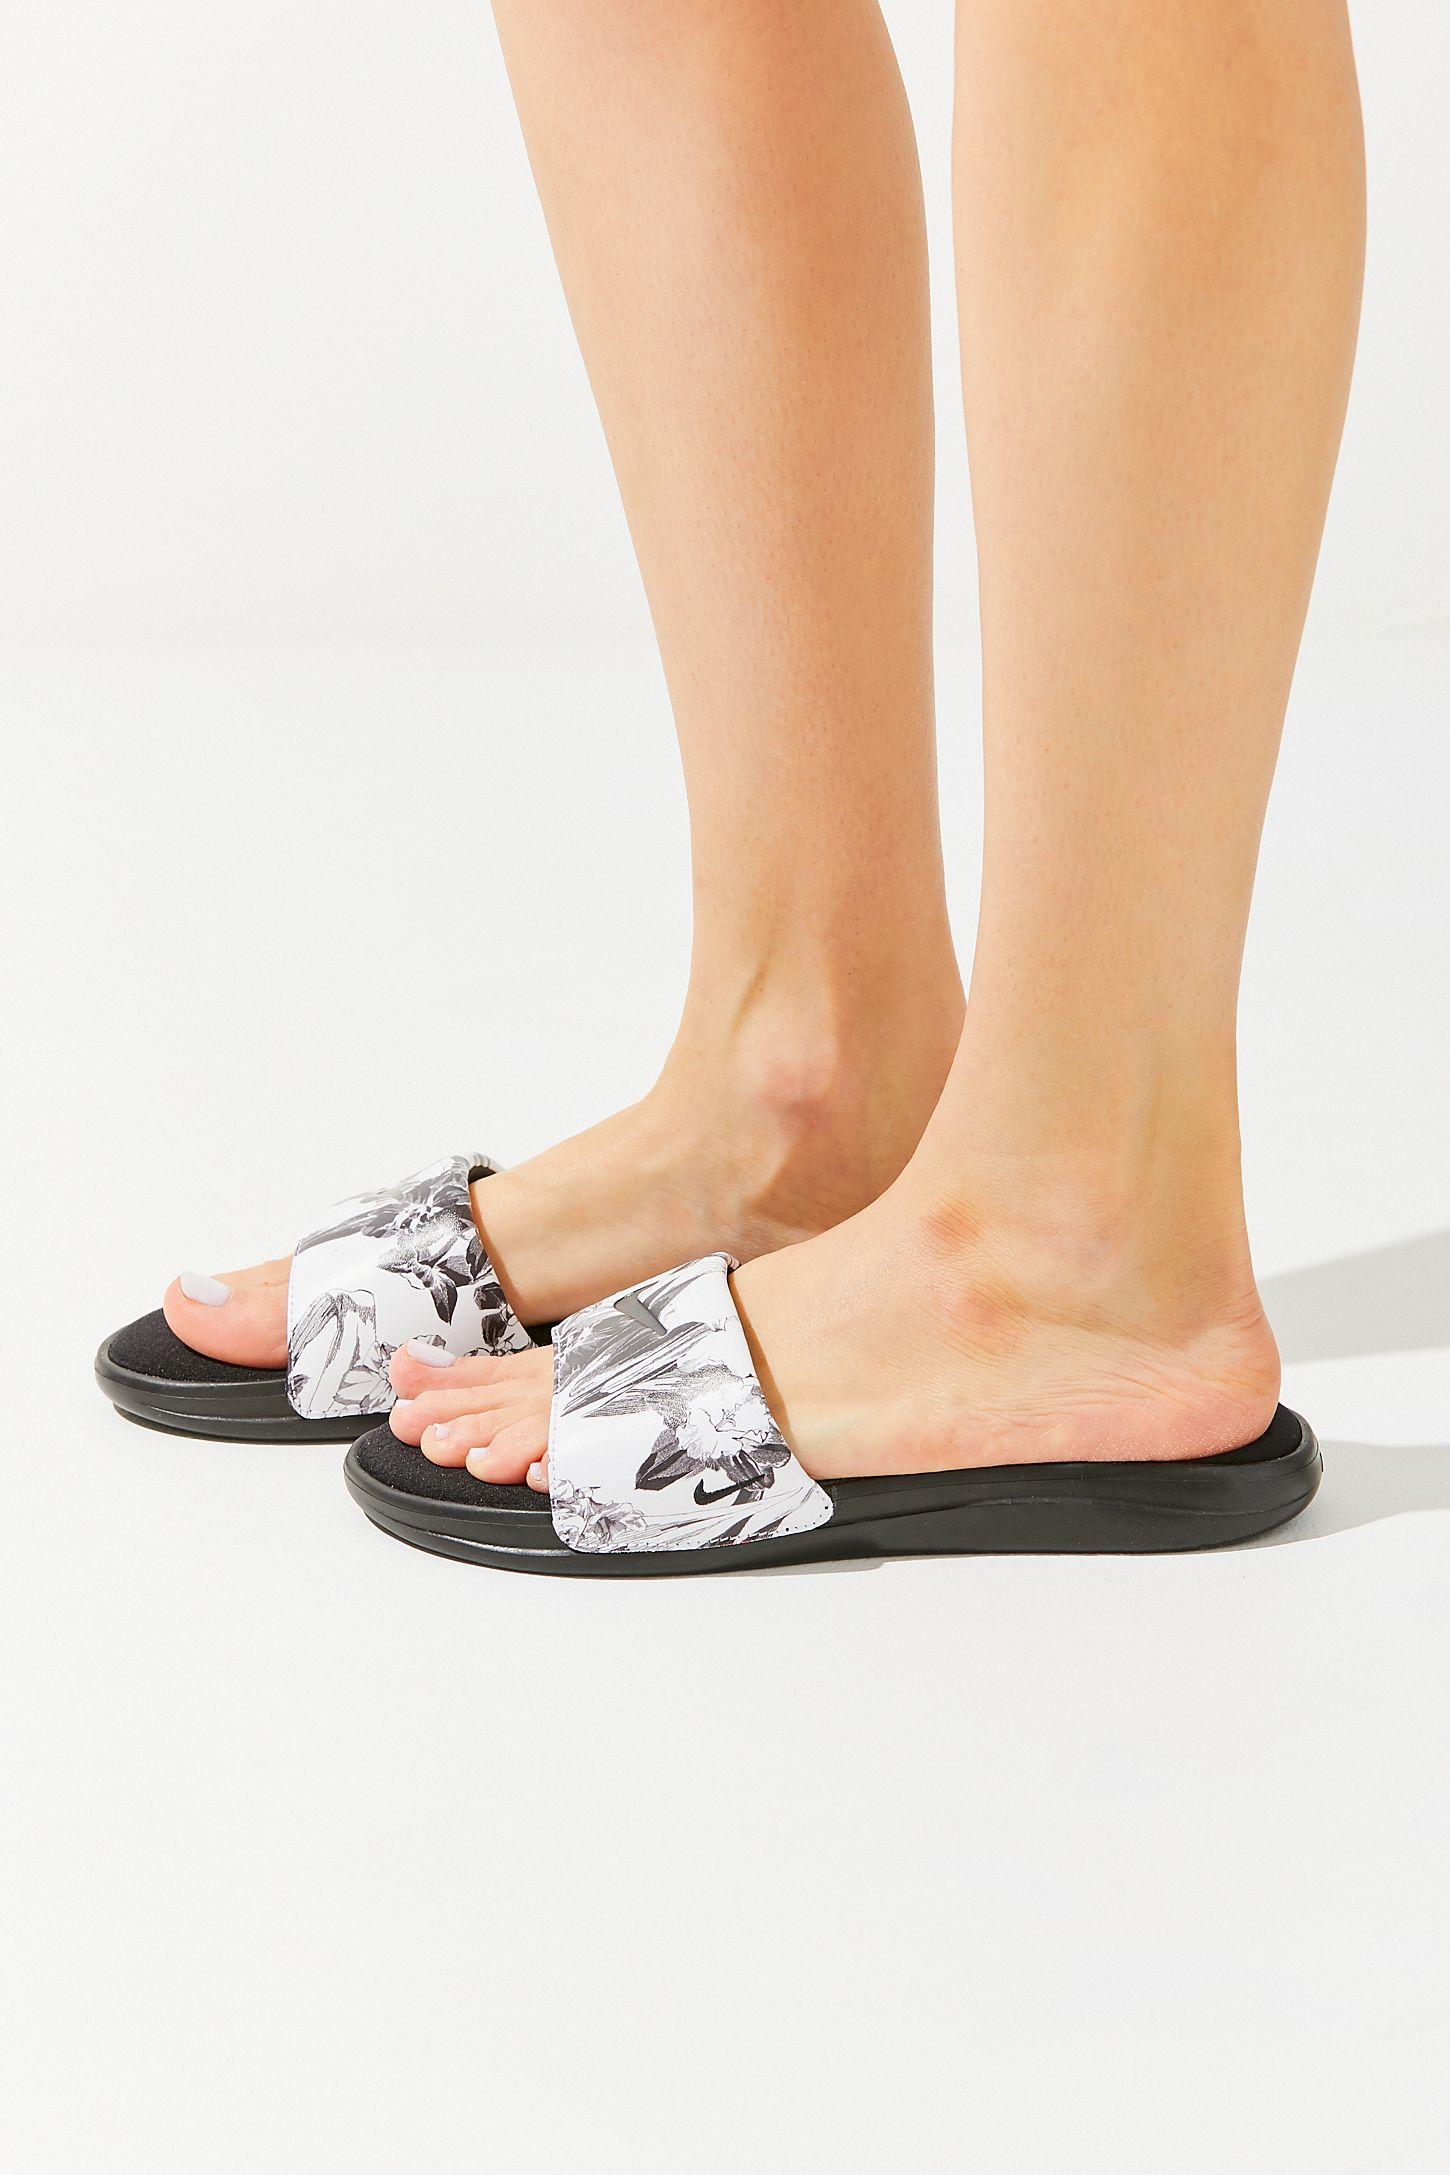 sports shoes b0c08 e9e30 Slide View  5  Nike Ultra Comfort 3 Floral Slide Sandal